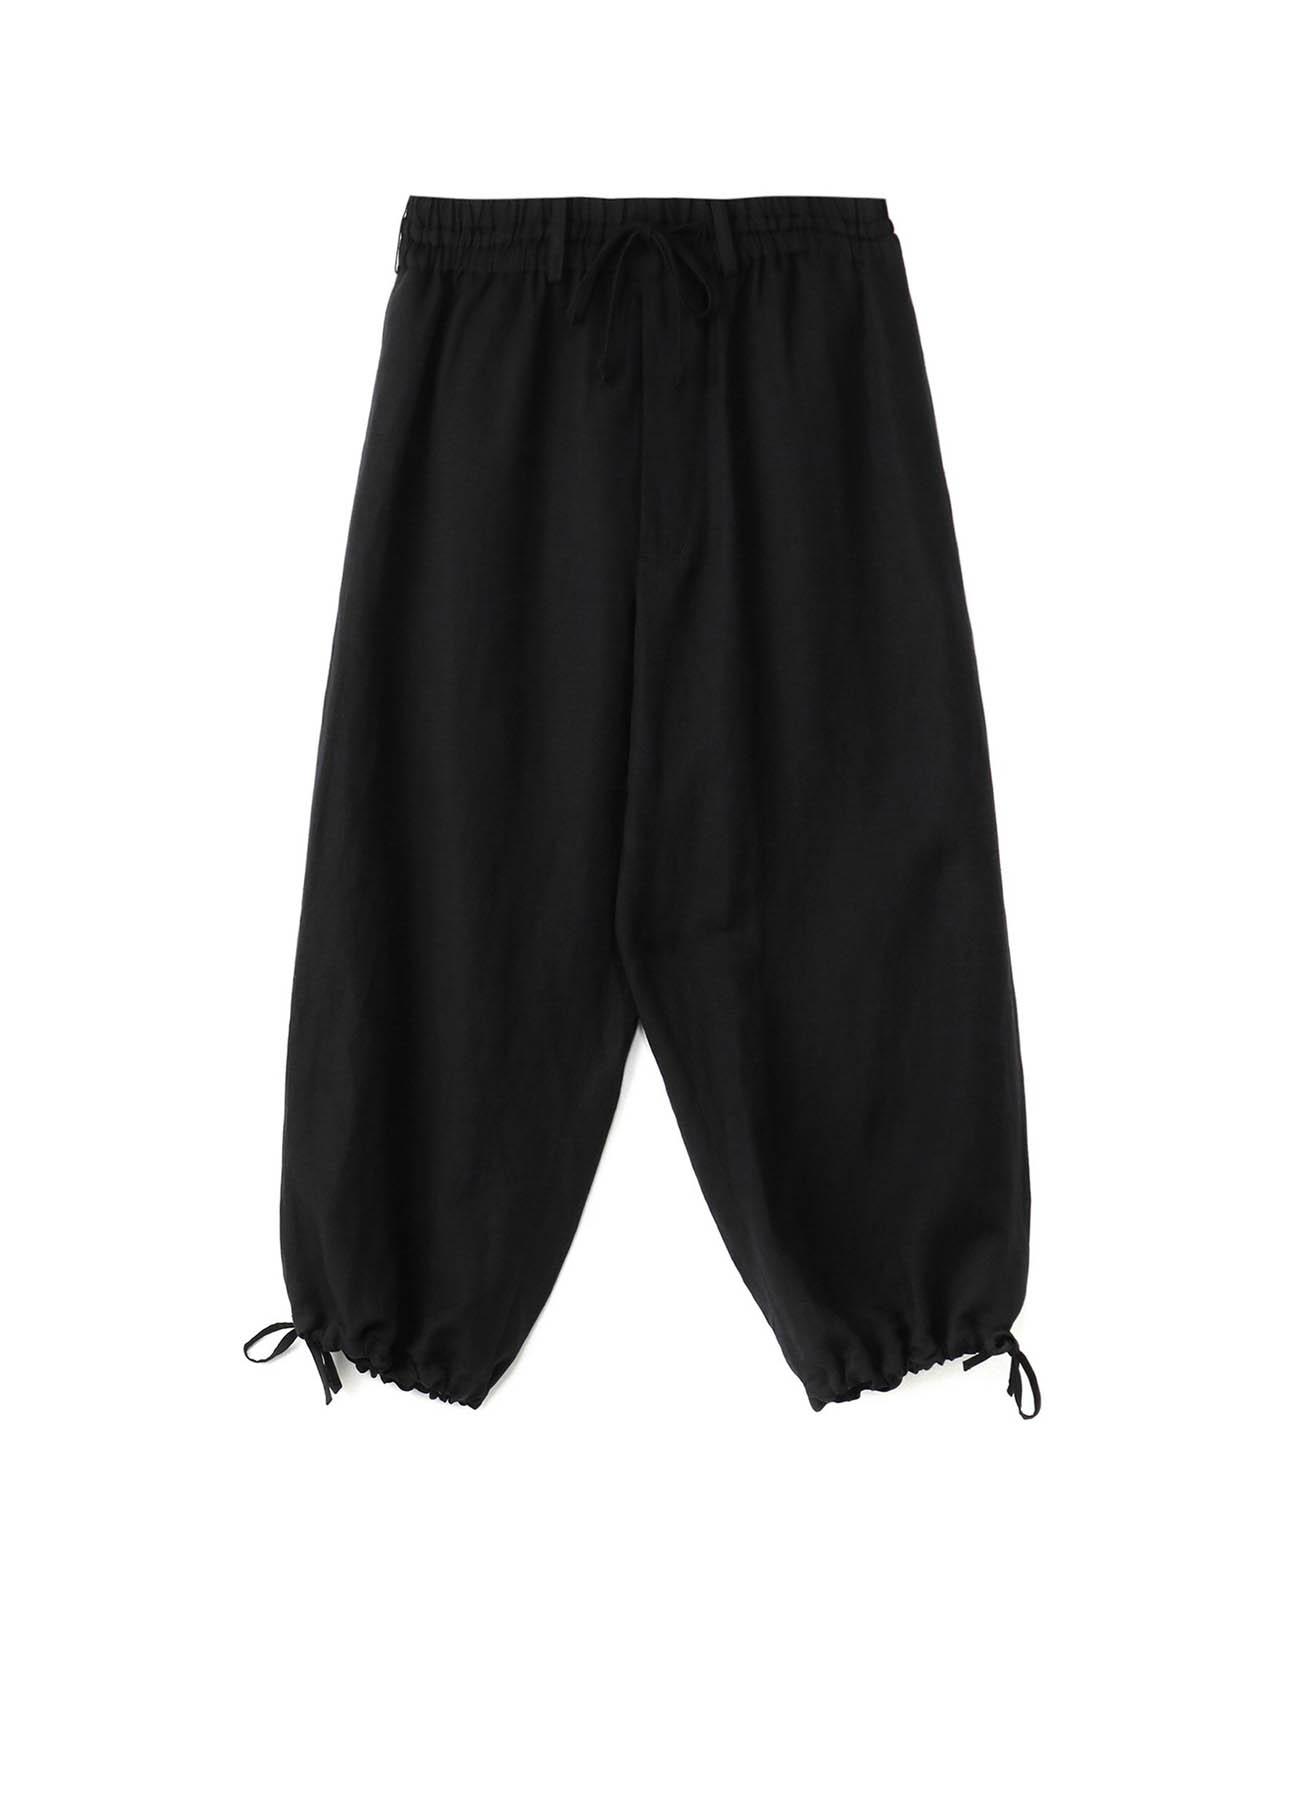 Ry/Li Easy Cross Balloon Pants